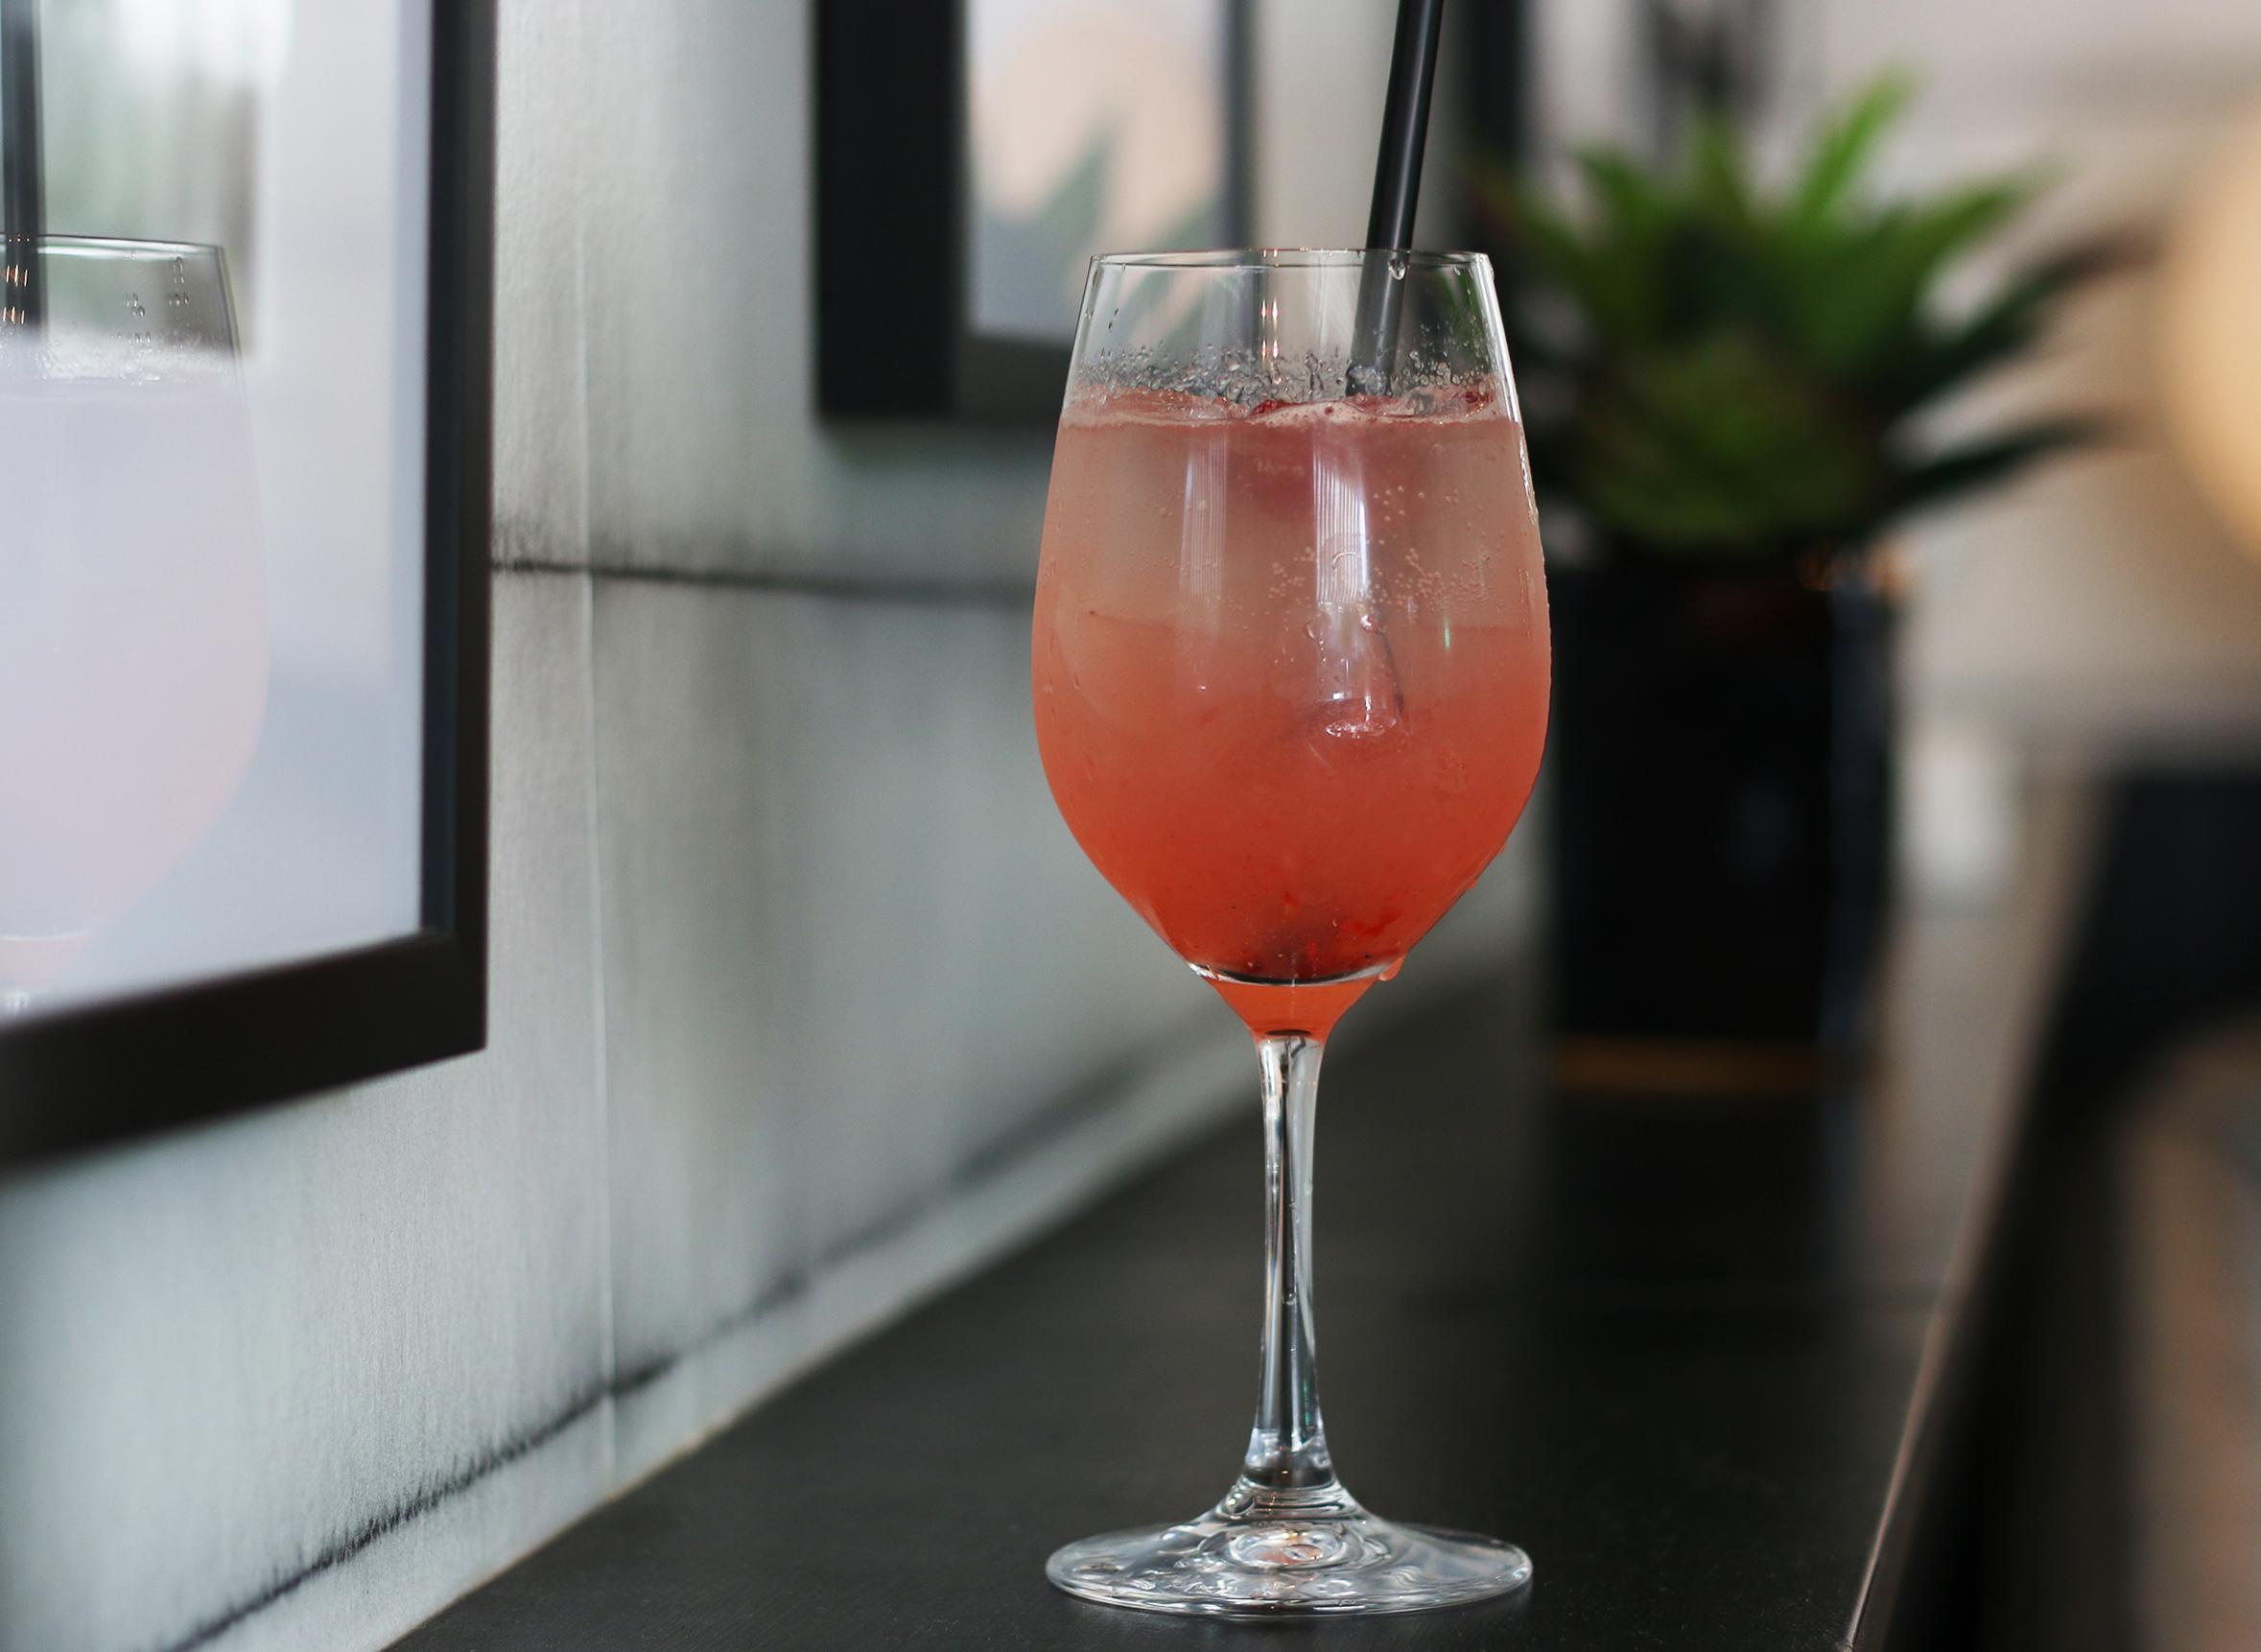 THE LOLITA : Belvedere Cherry Vodka, lemon juice, simple syrup, raspberries, ruffino prosecco, raspberry garnish